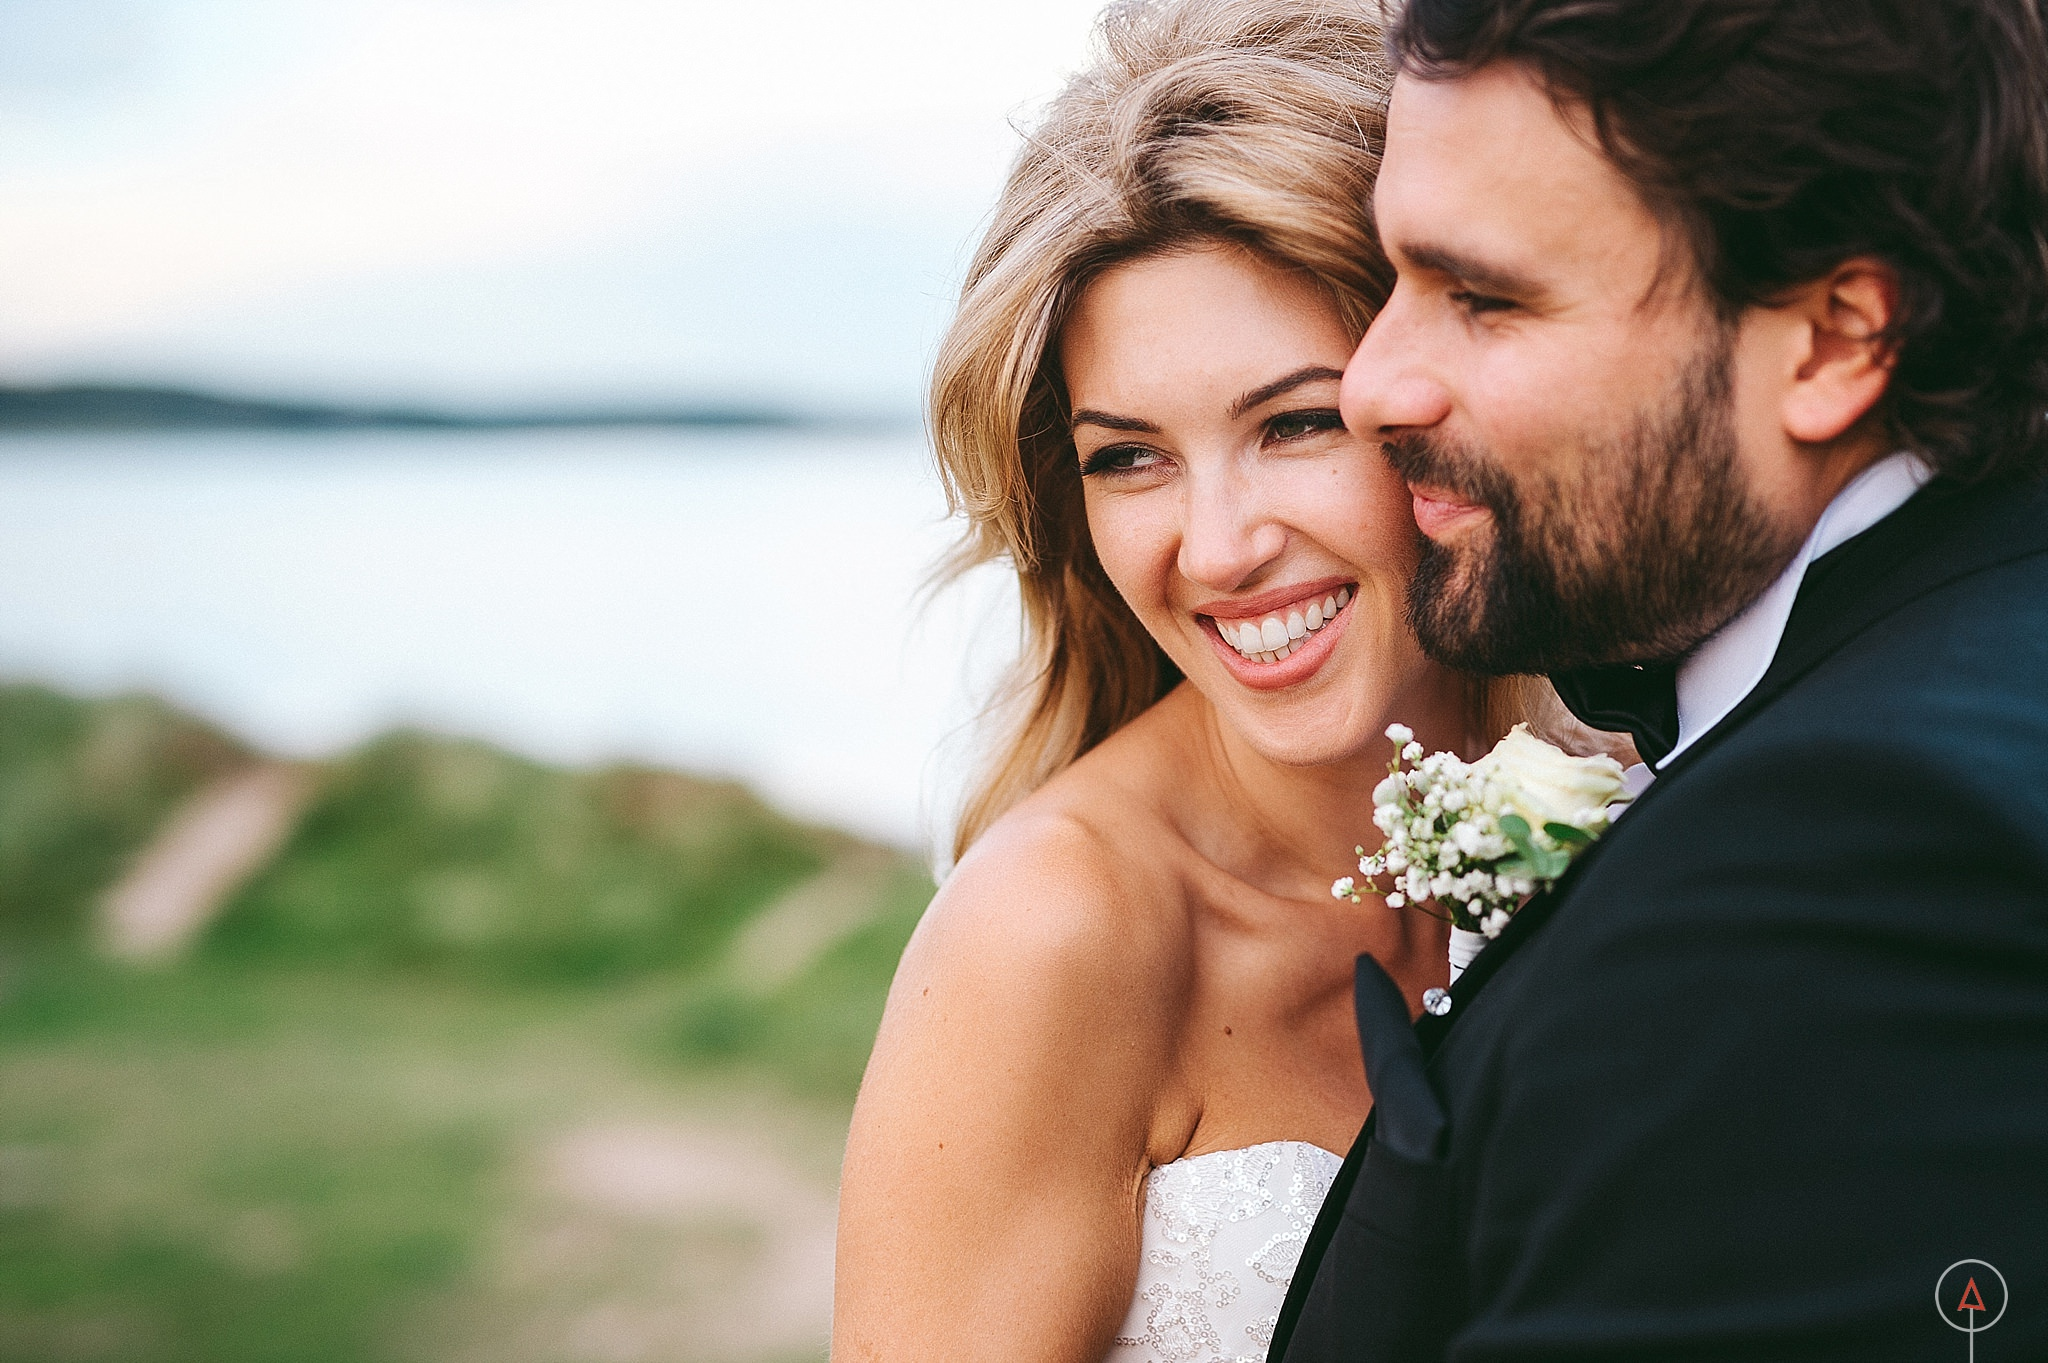 cardiff-wedding-photographer-aga-tomaszek_0408